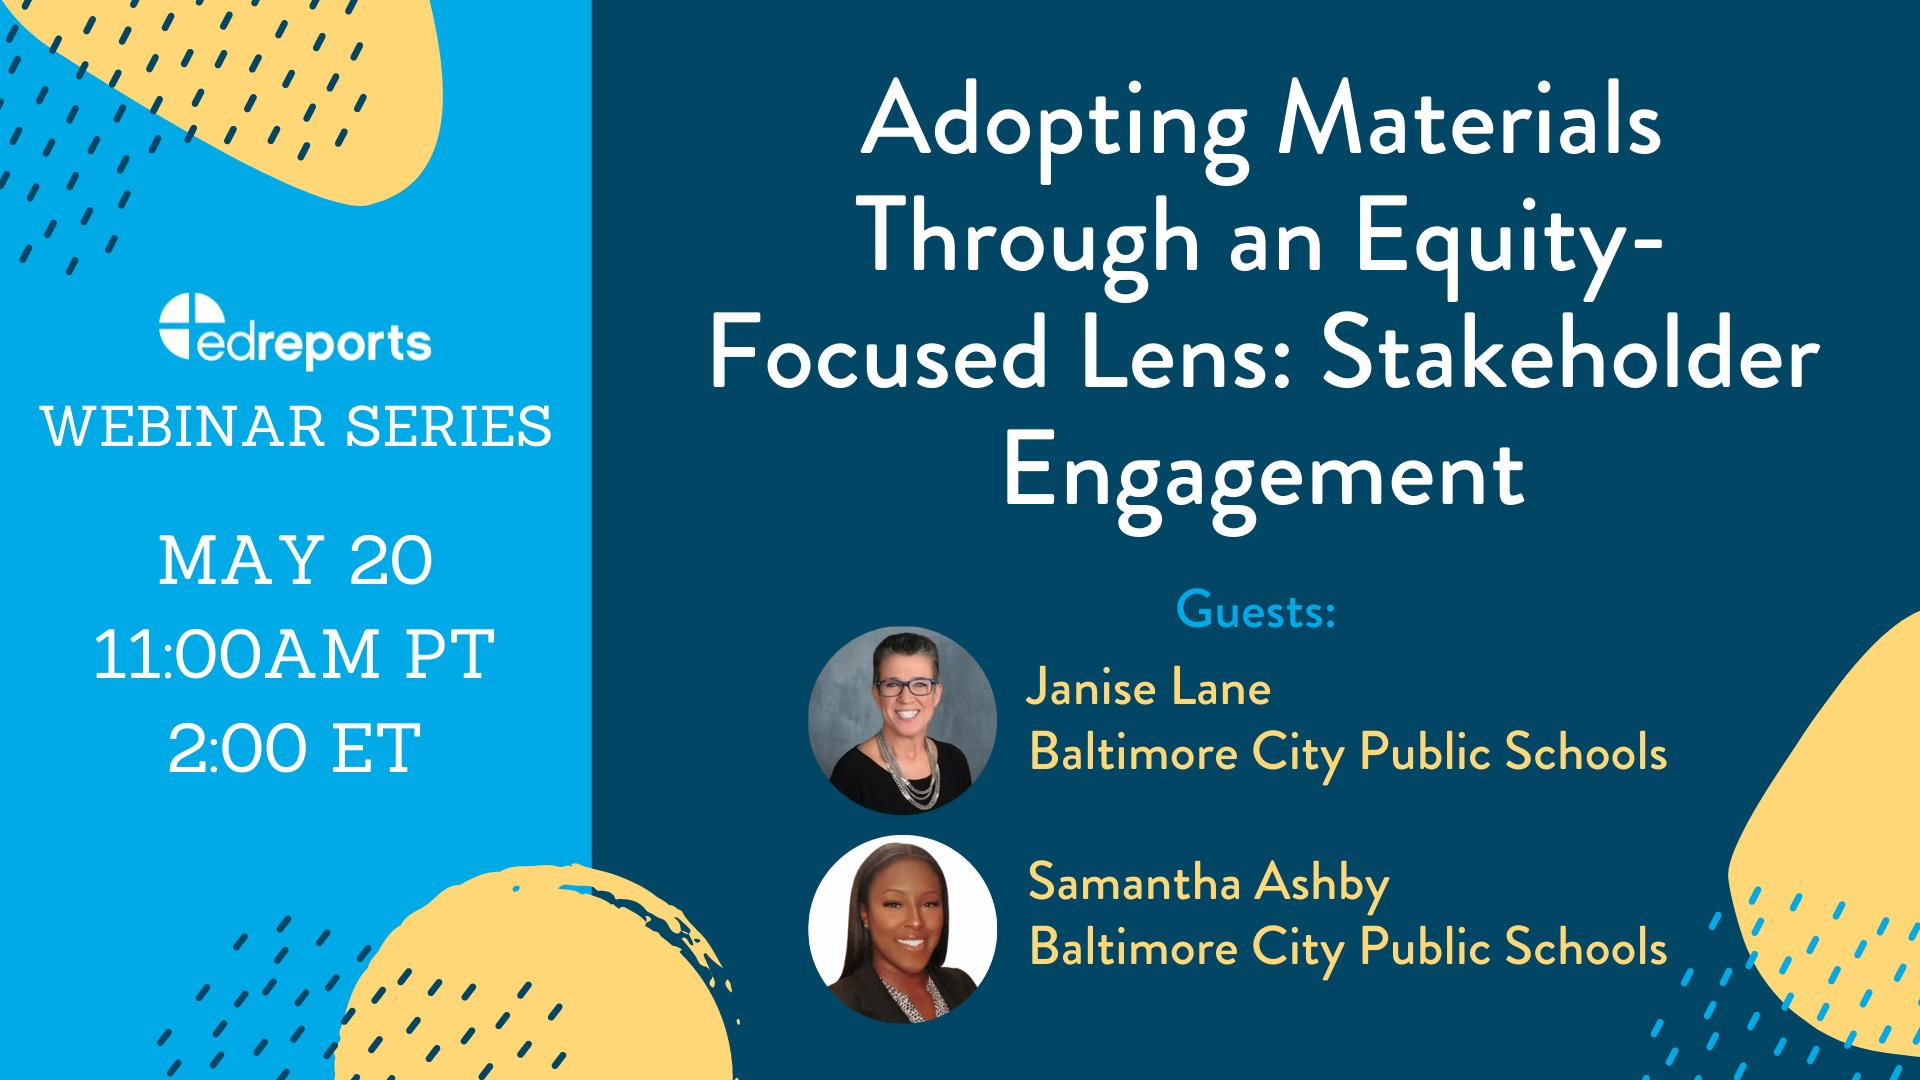 Webinar 4: Adopting Materials Through an Equity-Focused Lens: Stakeholder Engagement